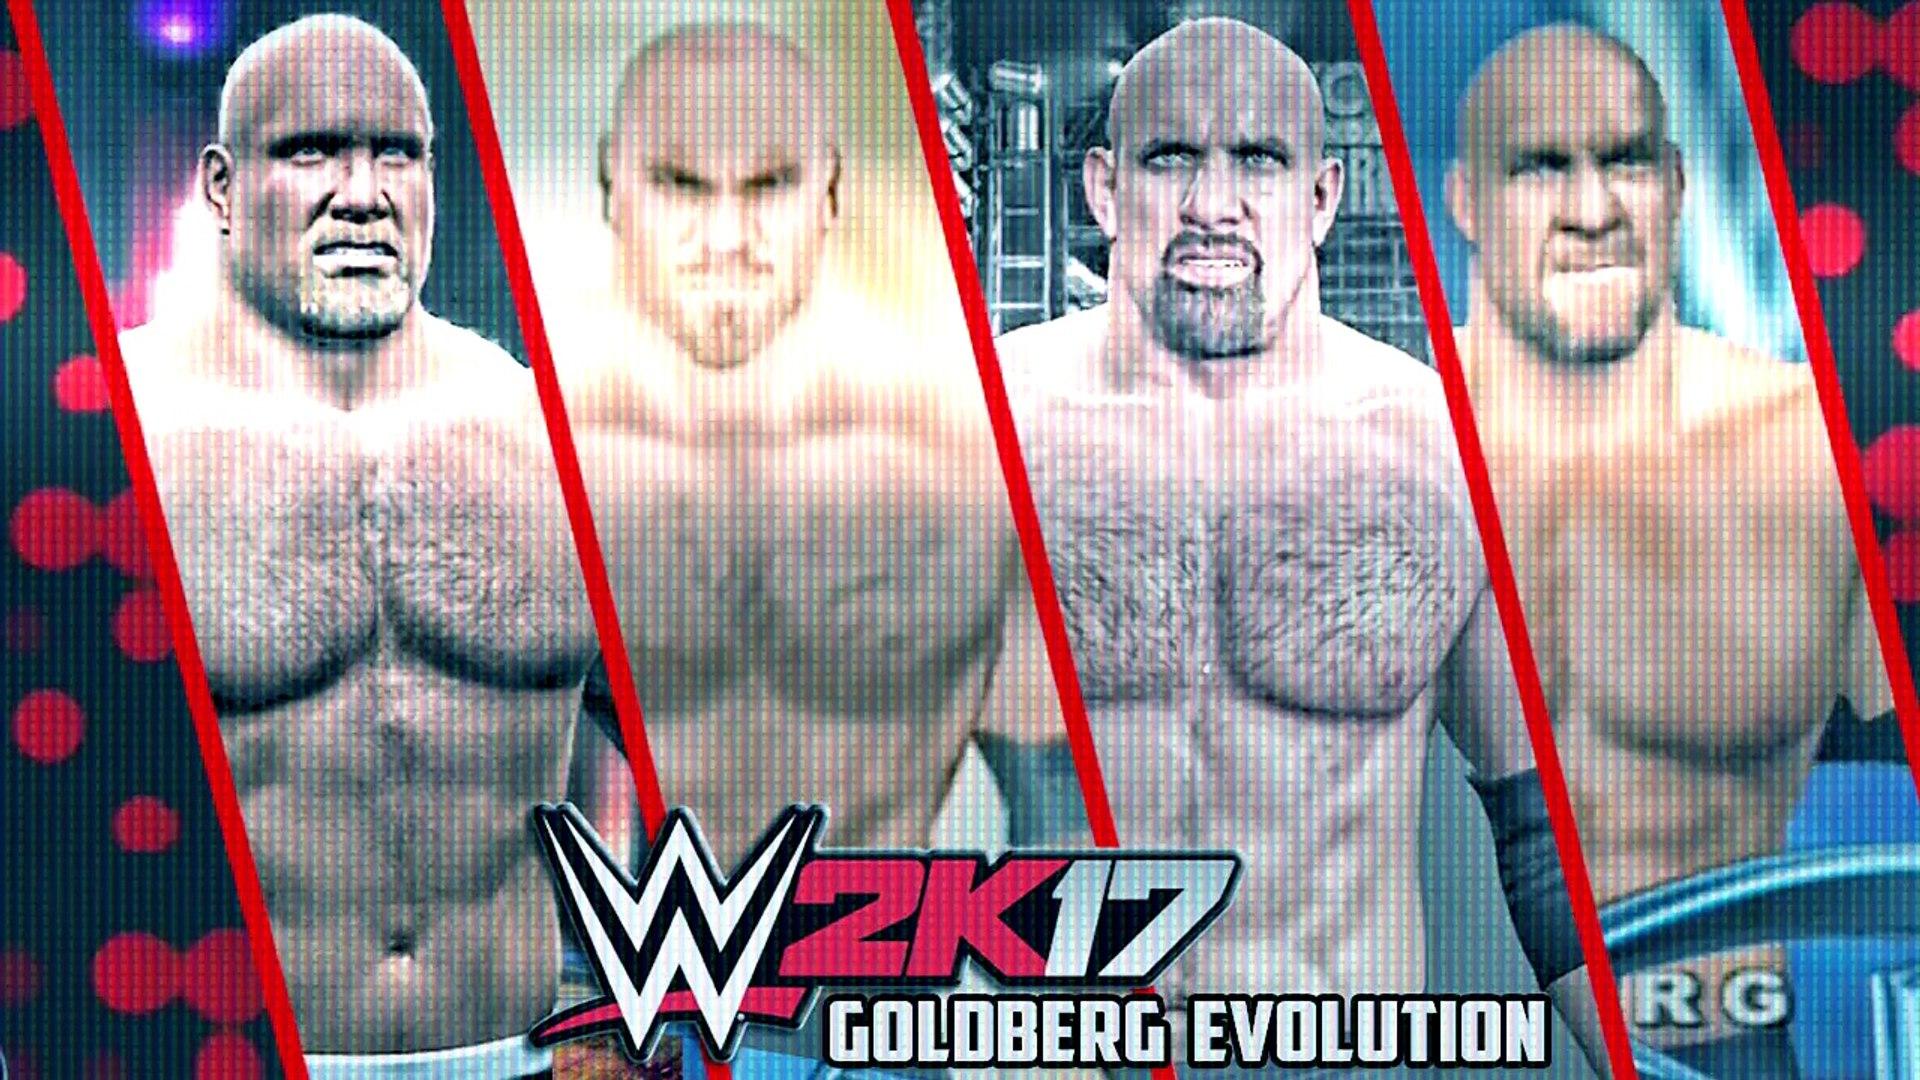 WWE 2K17 - Goldberg Entrance Evolution! ( WWE WrestleMania XIX To WWE 2K17 )